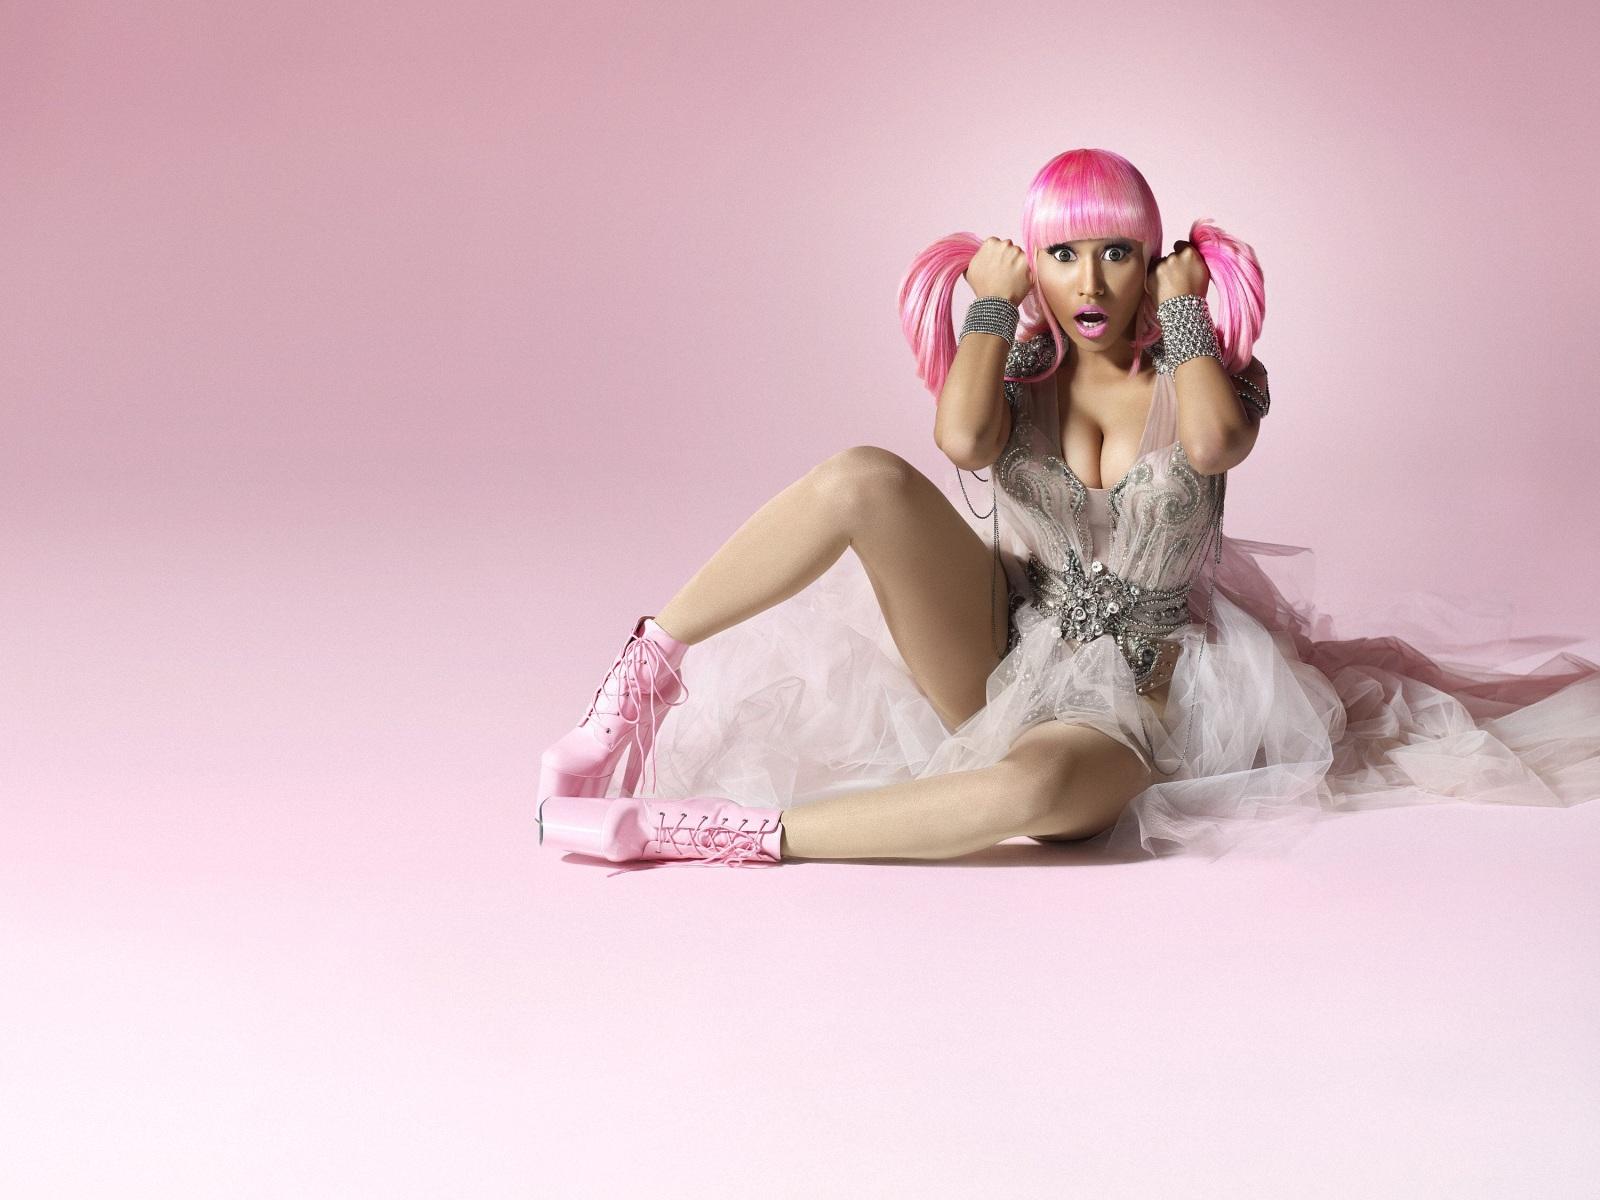 Nicki Minaj Computer Wallpaper 53364 1600x1200px